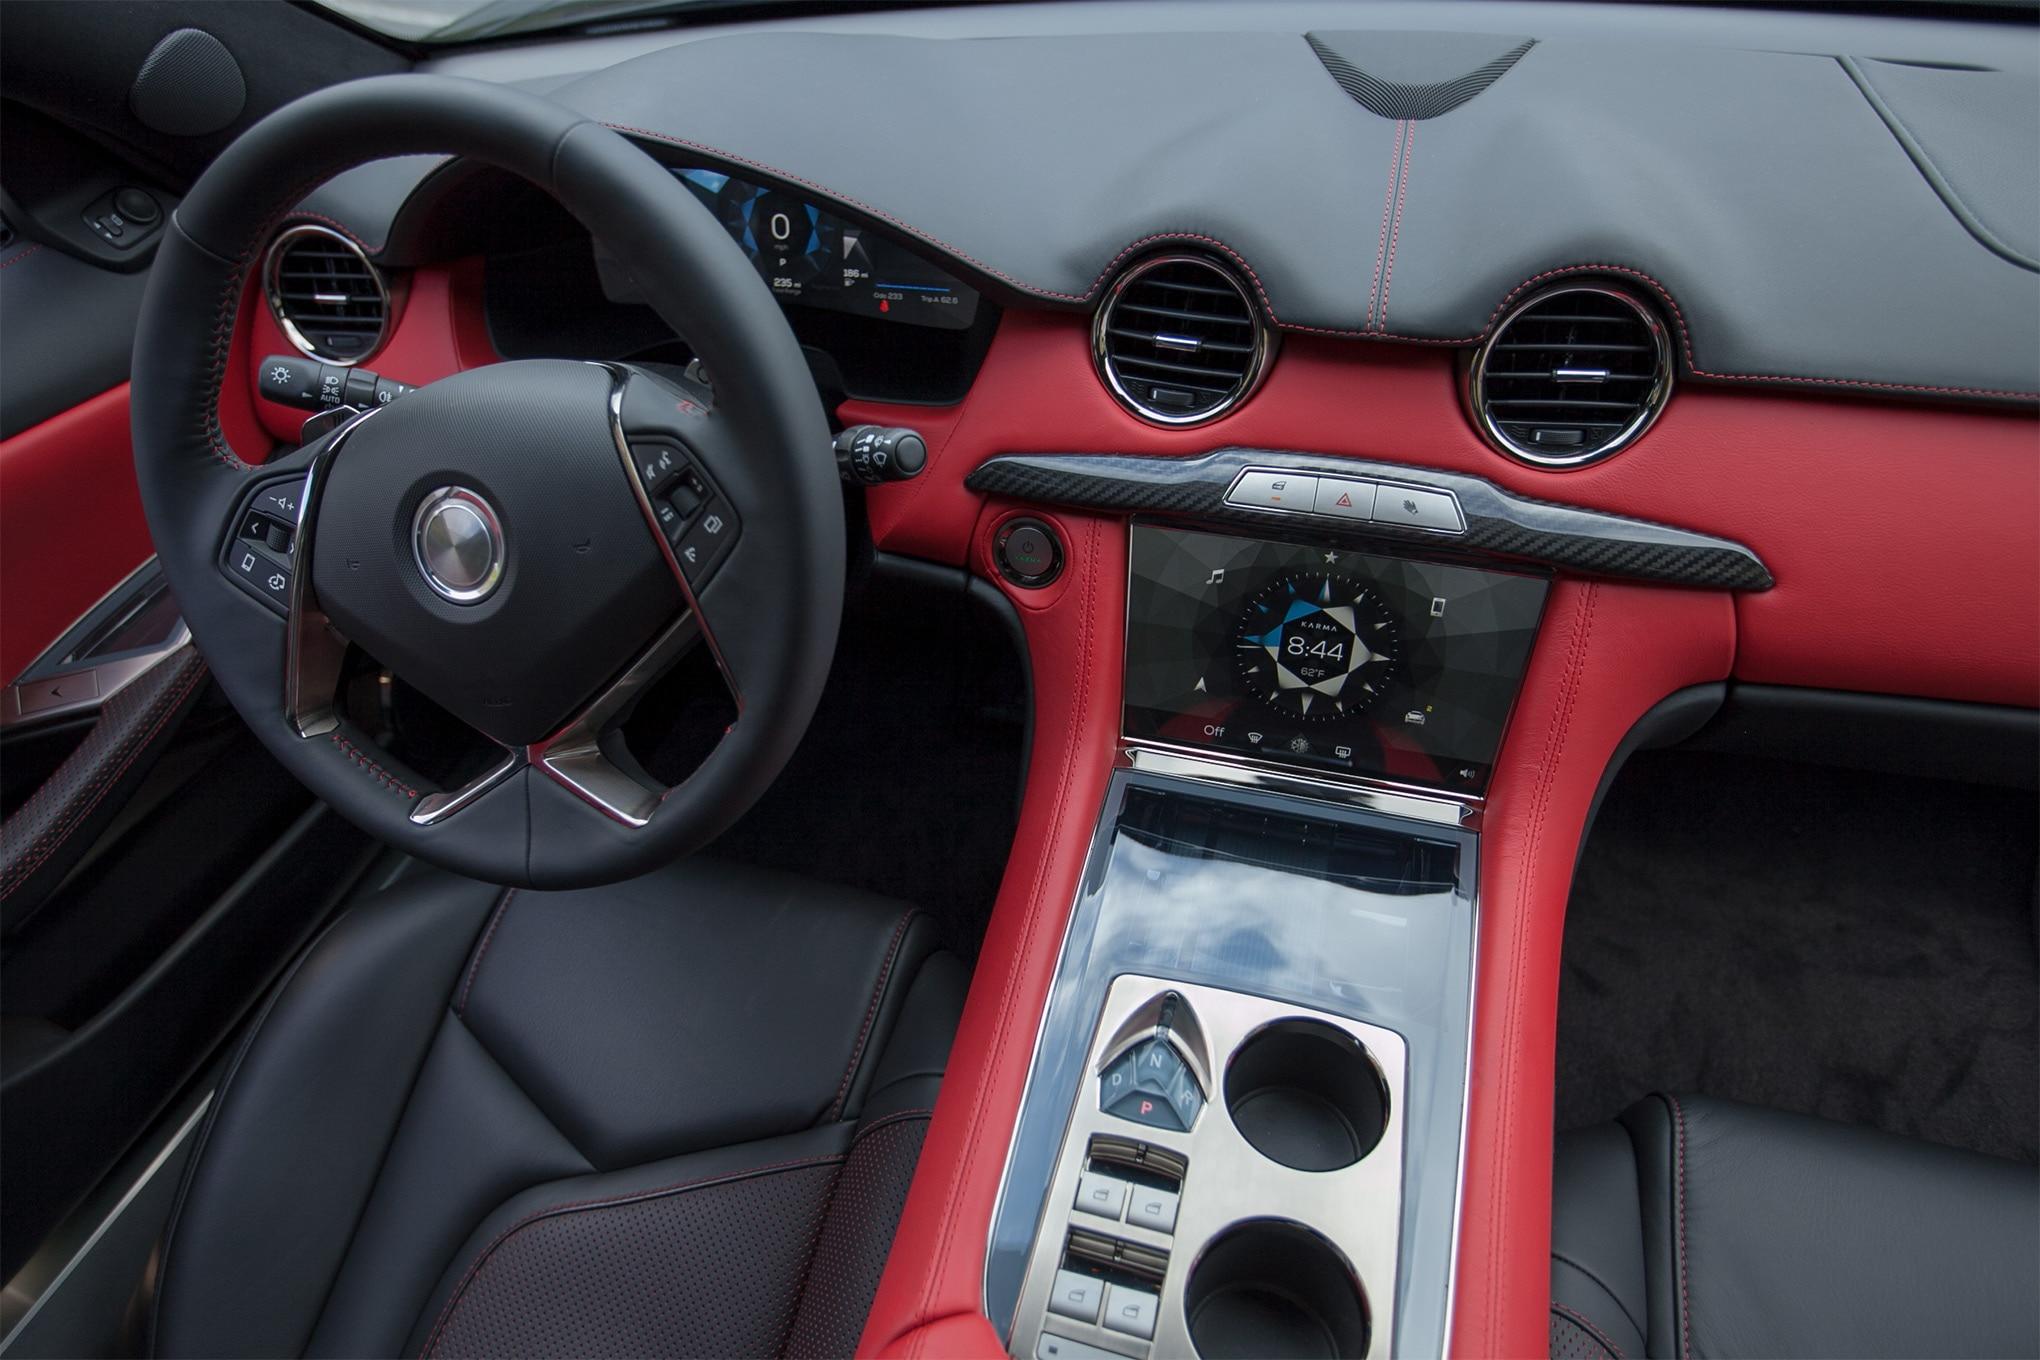 Power Steering System Diagrams Car Interior Design